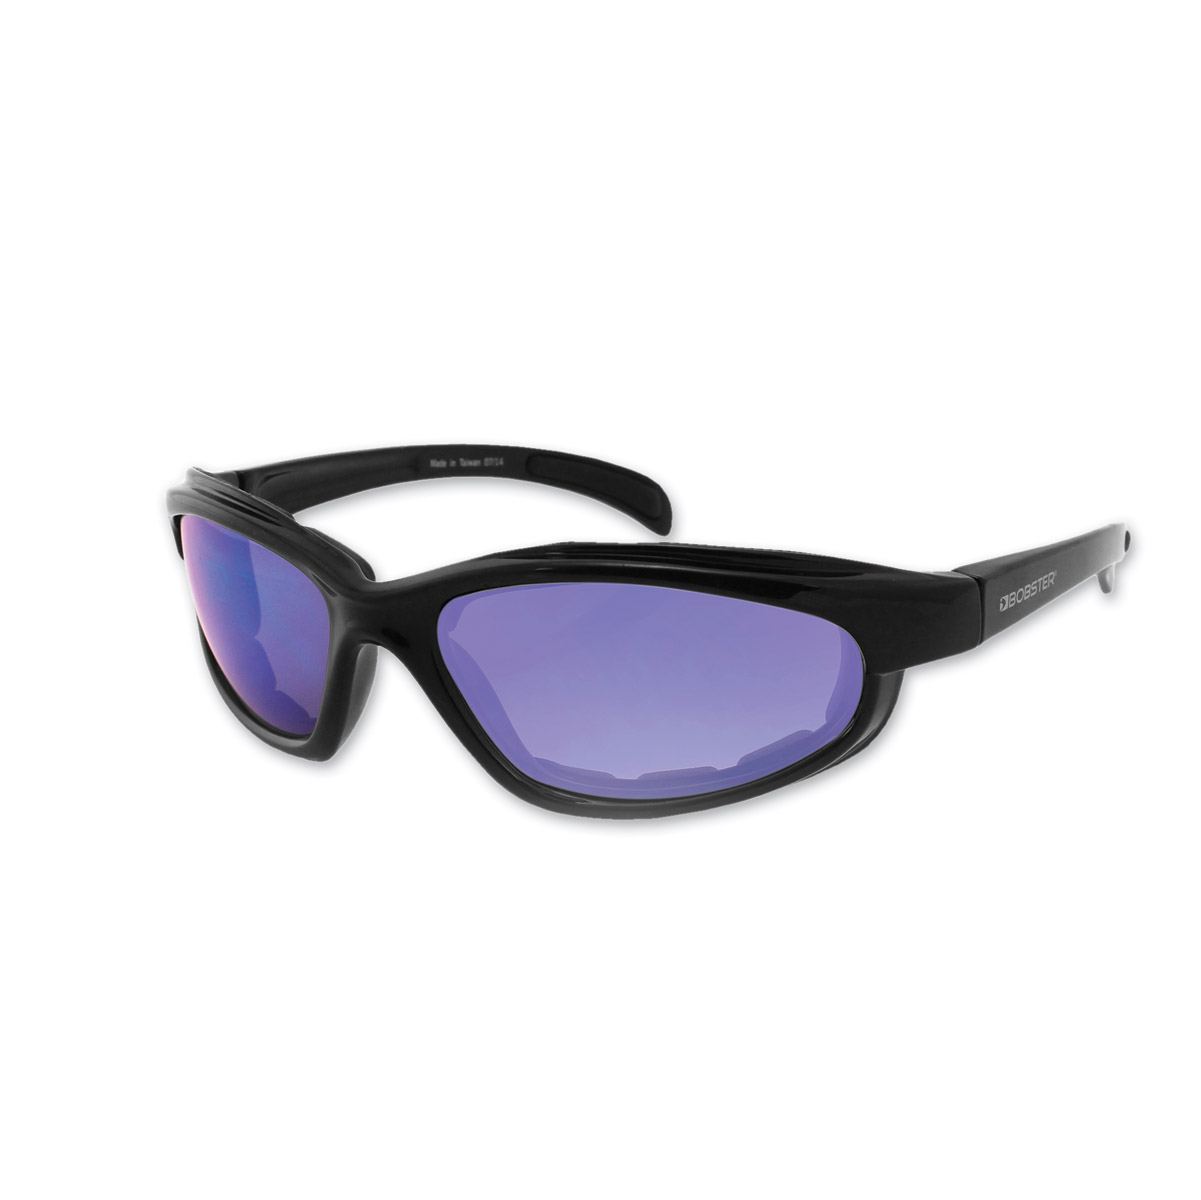 Bobster Fat Boy Black Frame Sunglasses w/Smoked Blue Mirror Lenses